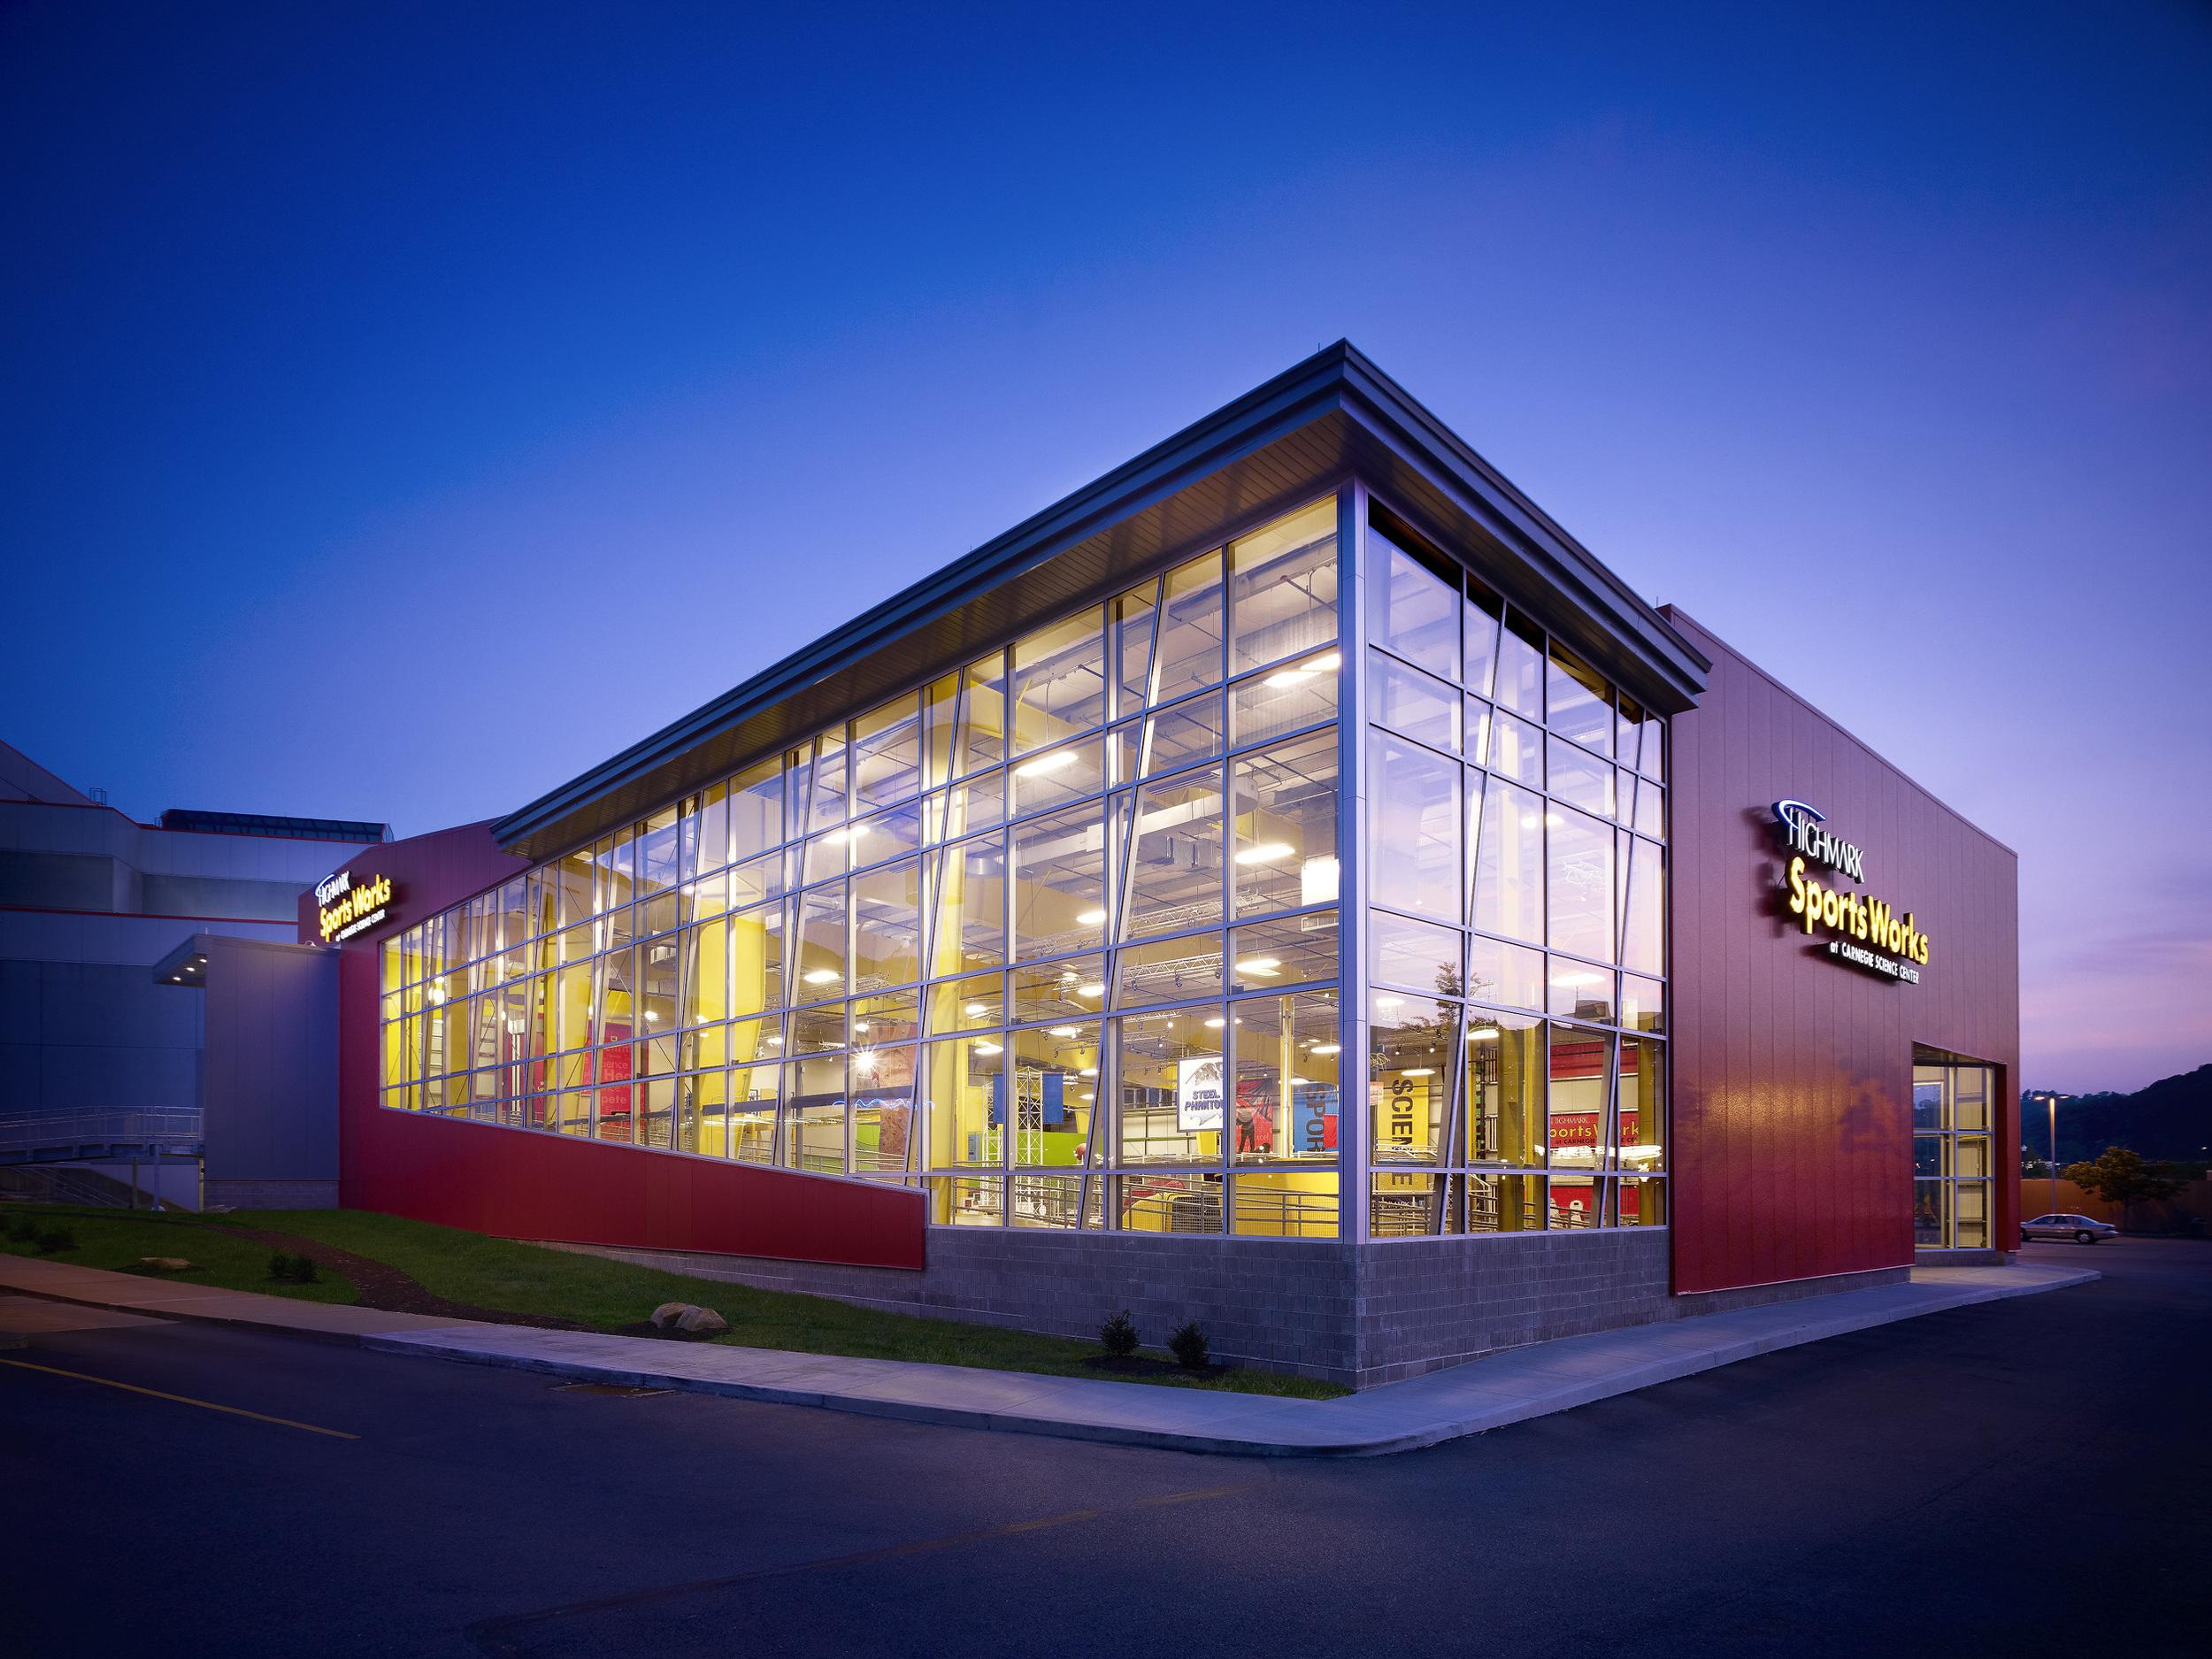 Carnegie Museums of Pittsburgh  SportsWorks Museum